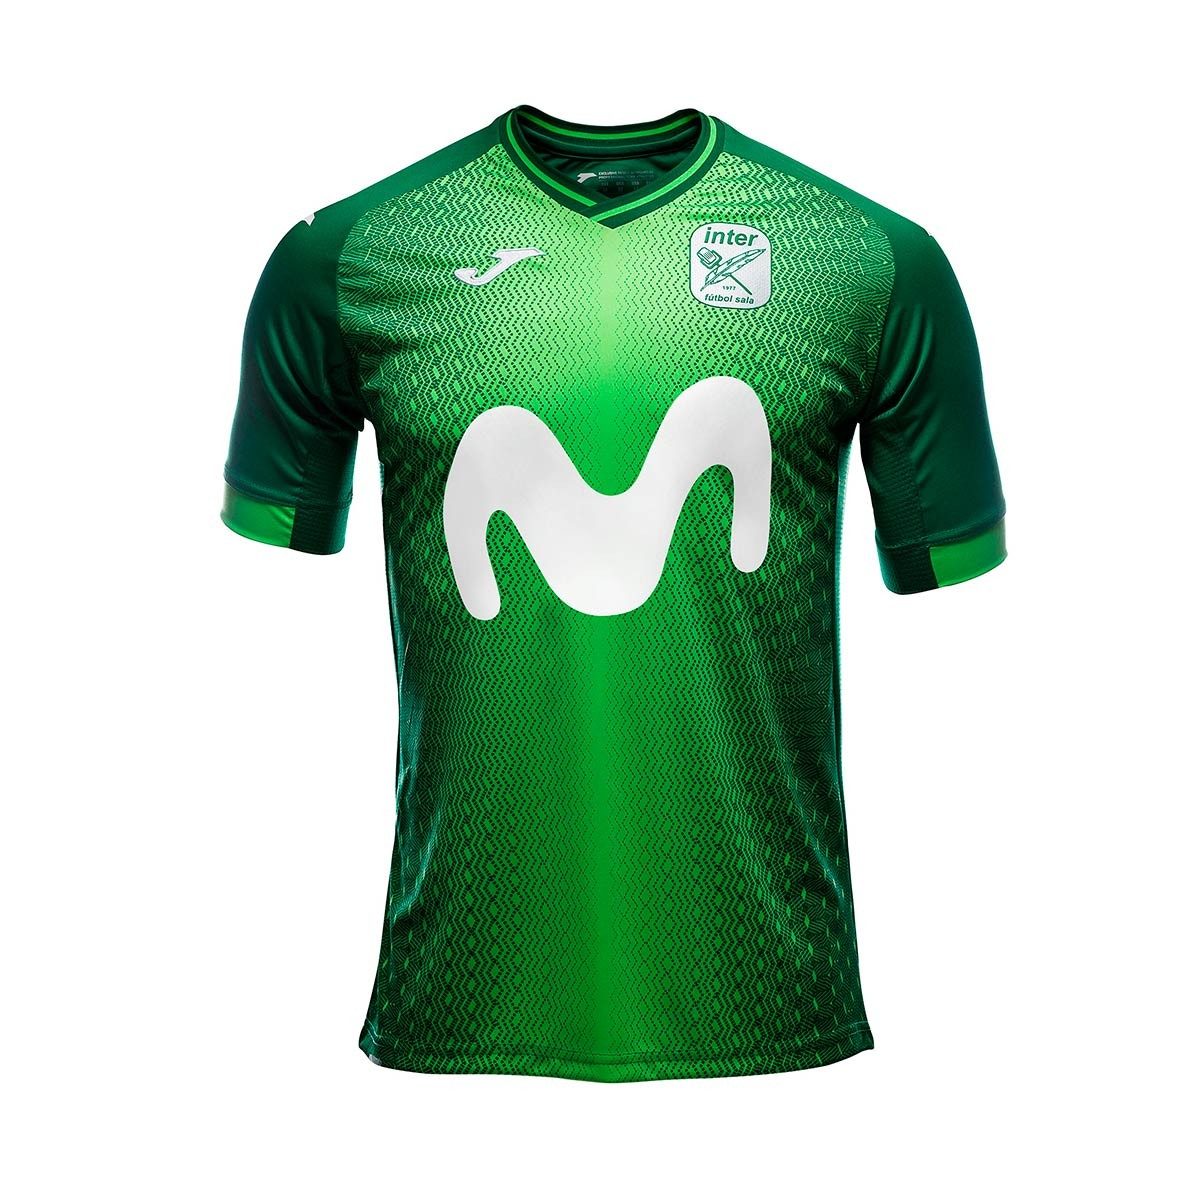 590a26f6e08 Jersey Joma Movistar Inter FS2018-2019 Away Green - Football store ...